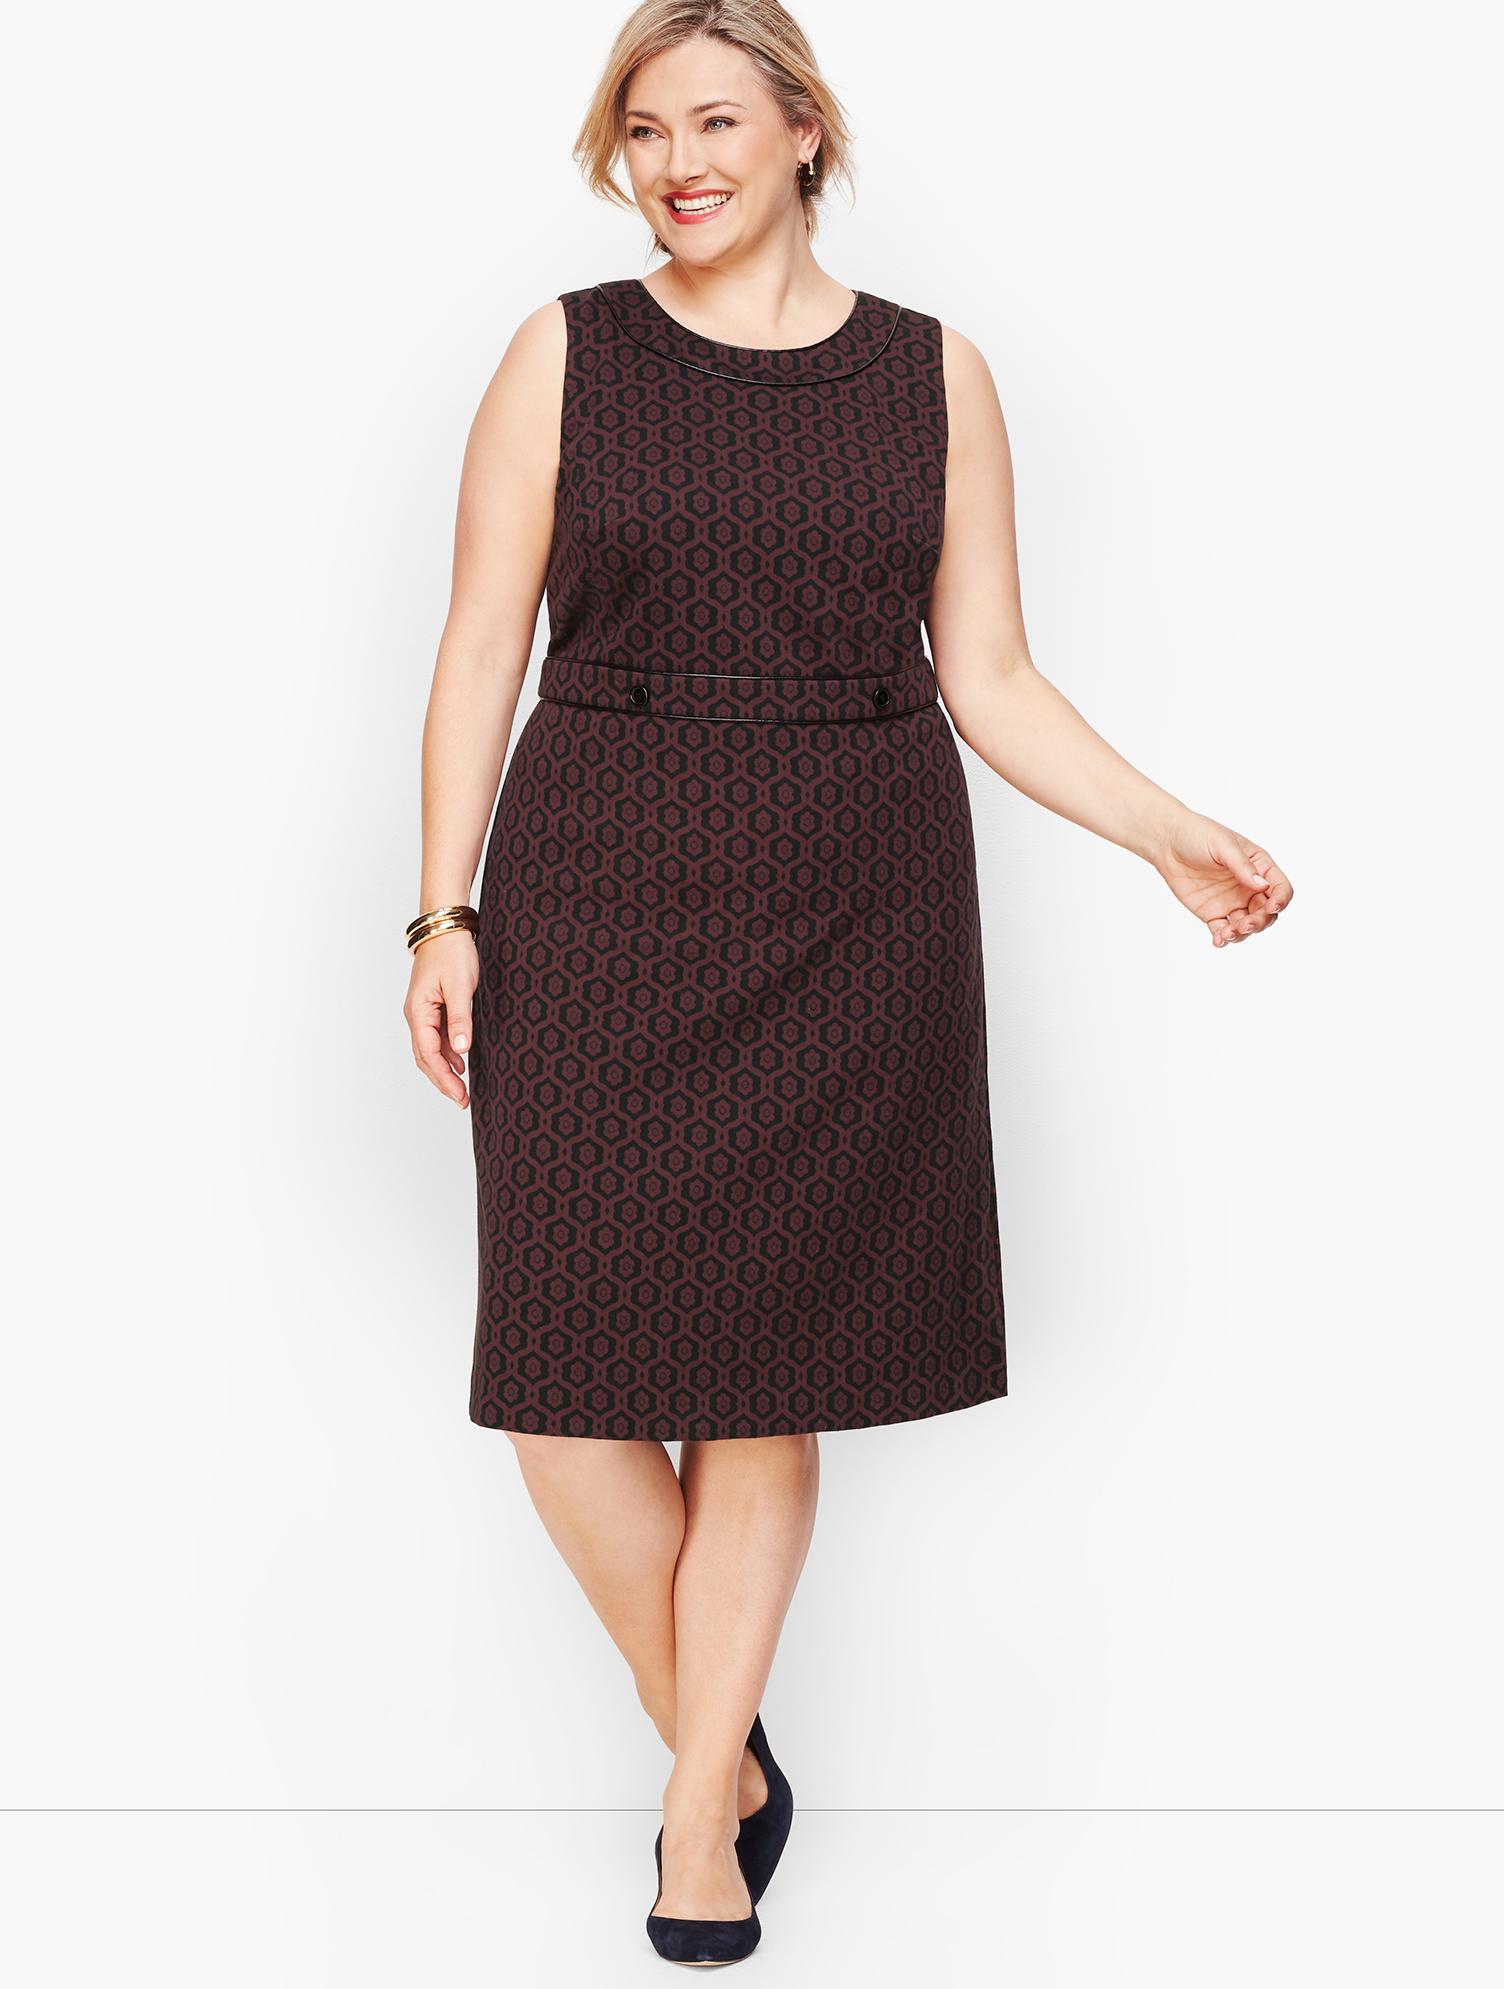 60s 70s Plus Size Dresses, Clothing, Costumes Tipped Geo Floral Sheath Dress - BLACKRICH-BURGUNDY - 24 - Talbots $54.59 AT vintagedancer.com